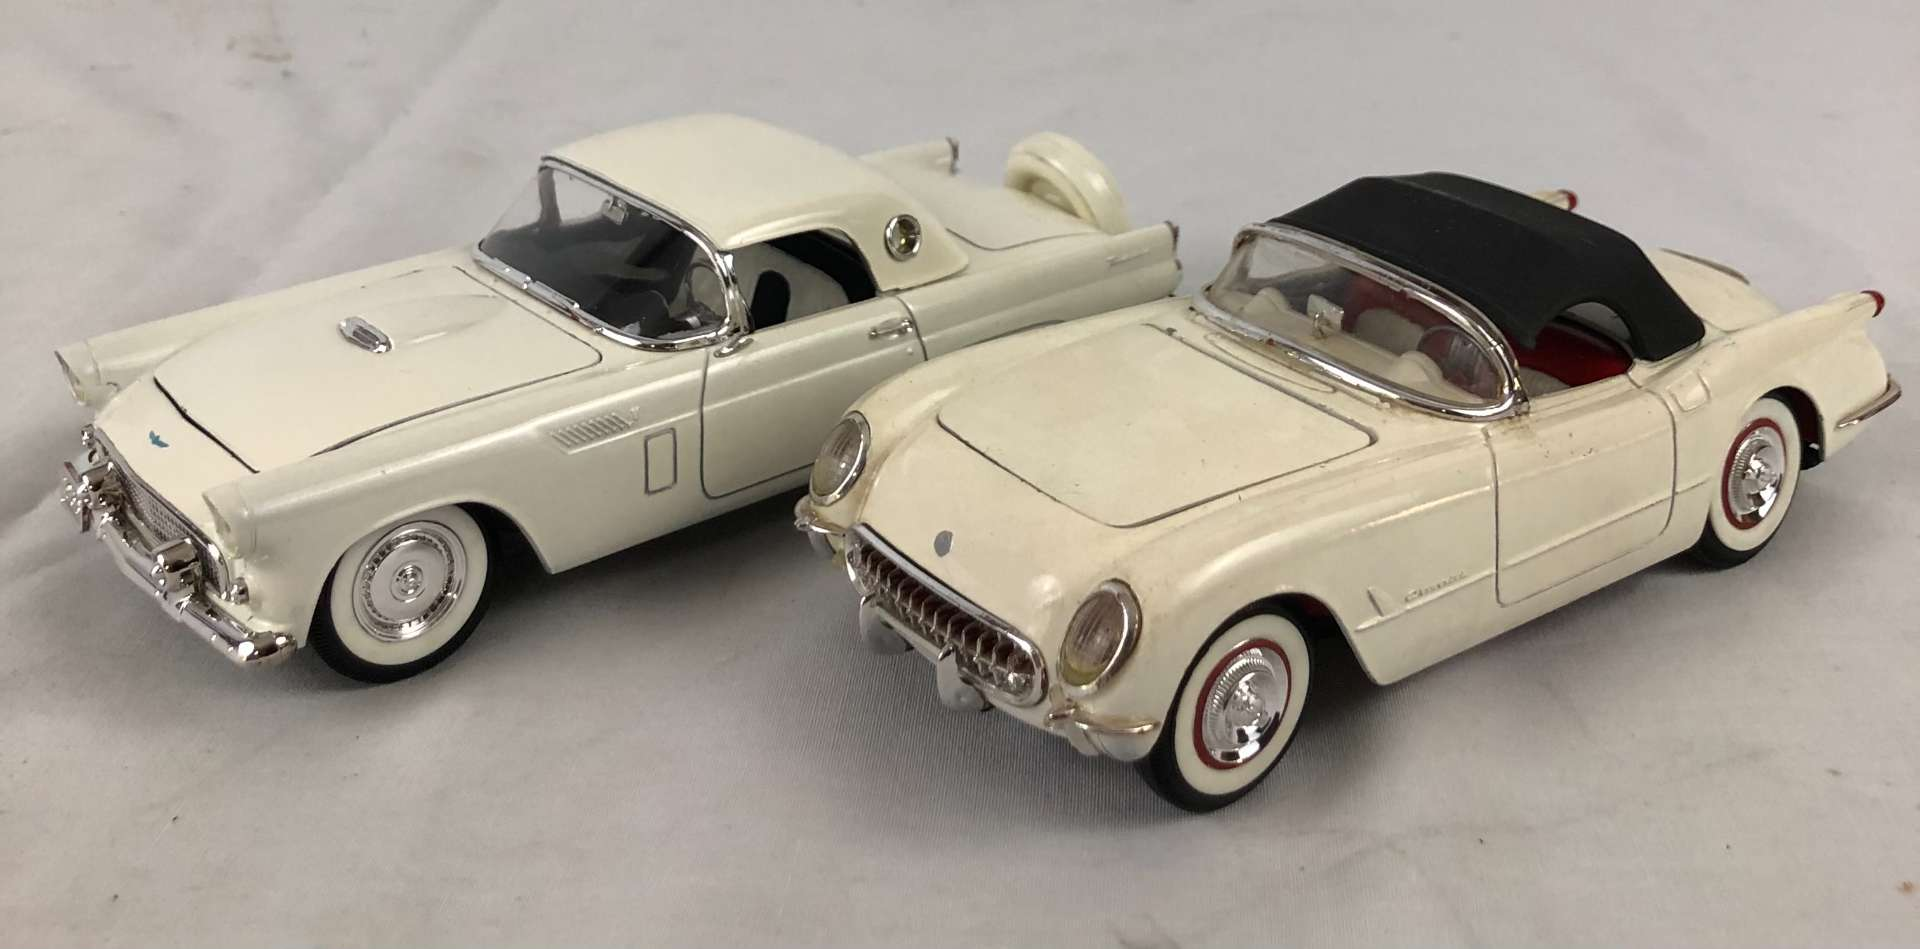 Lot # 155 - Lot of 2 Models, 1956 Thunderbird and Corvette  (main image)